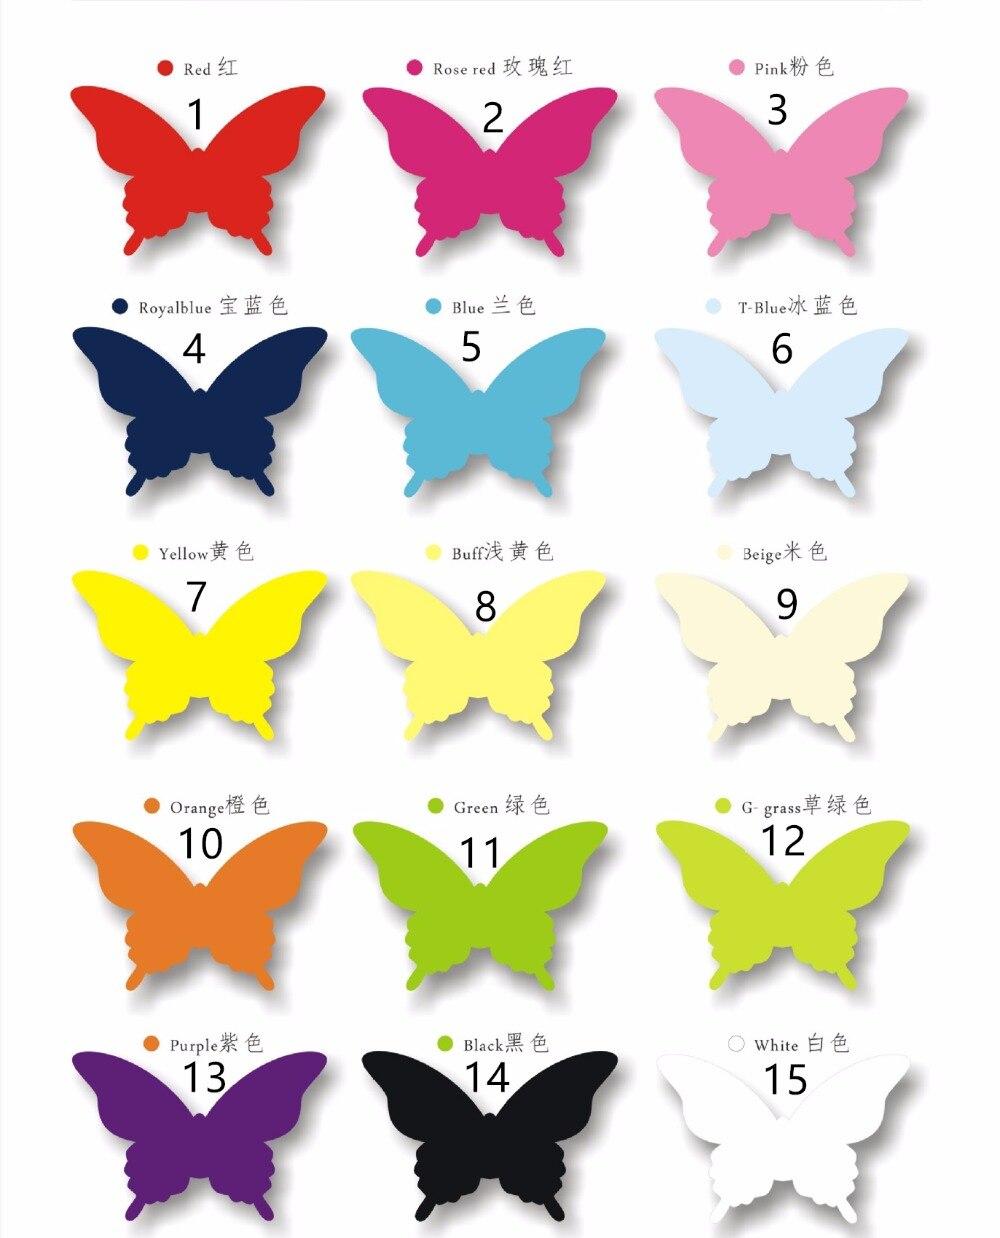 20pcs 15color Laser Cut Vine Butterfly Paper Place Card / Escort Card/Invitation Card For Wedding Party Decoration Home Decor